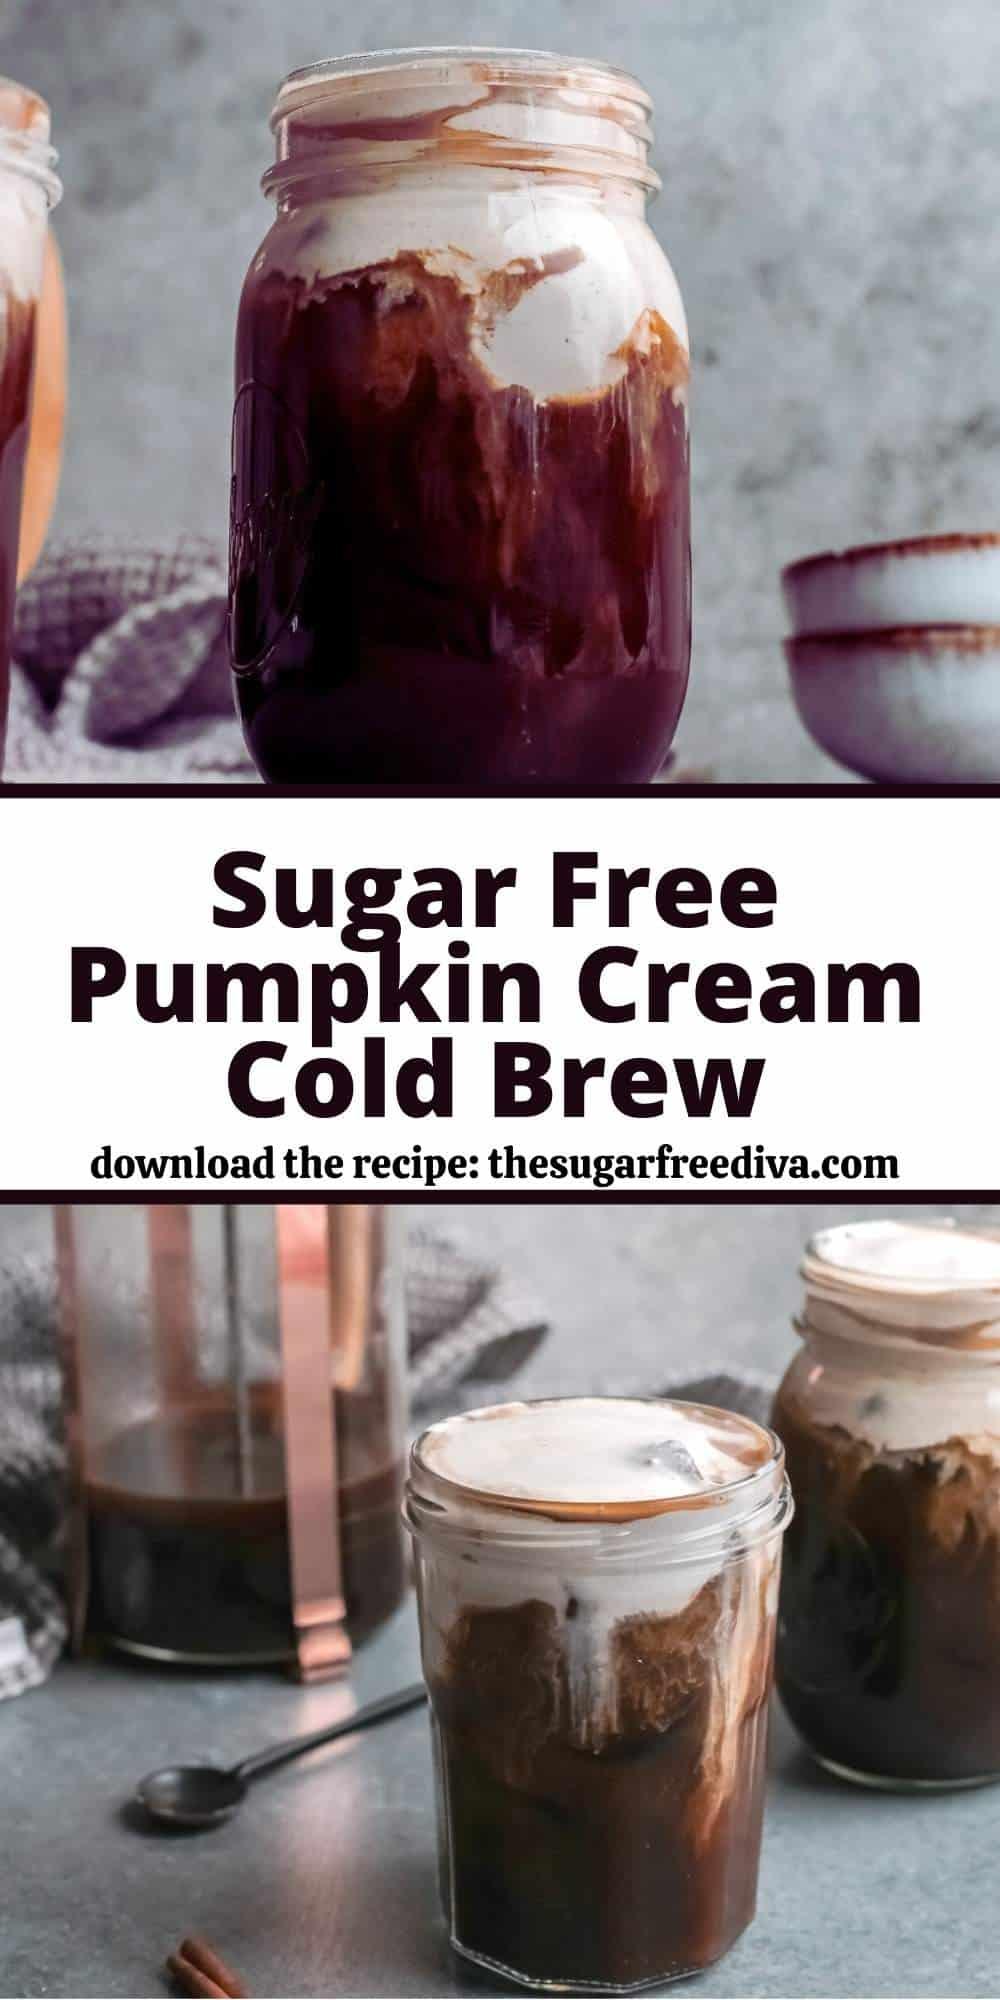 Sugar Free Pumpkin Cream Cold Brew